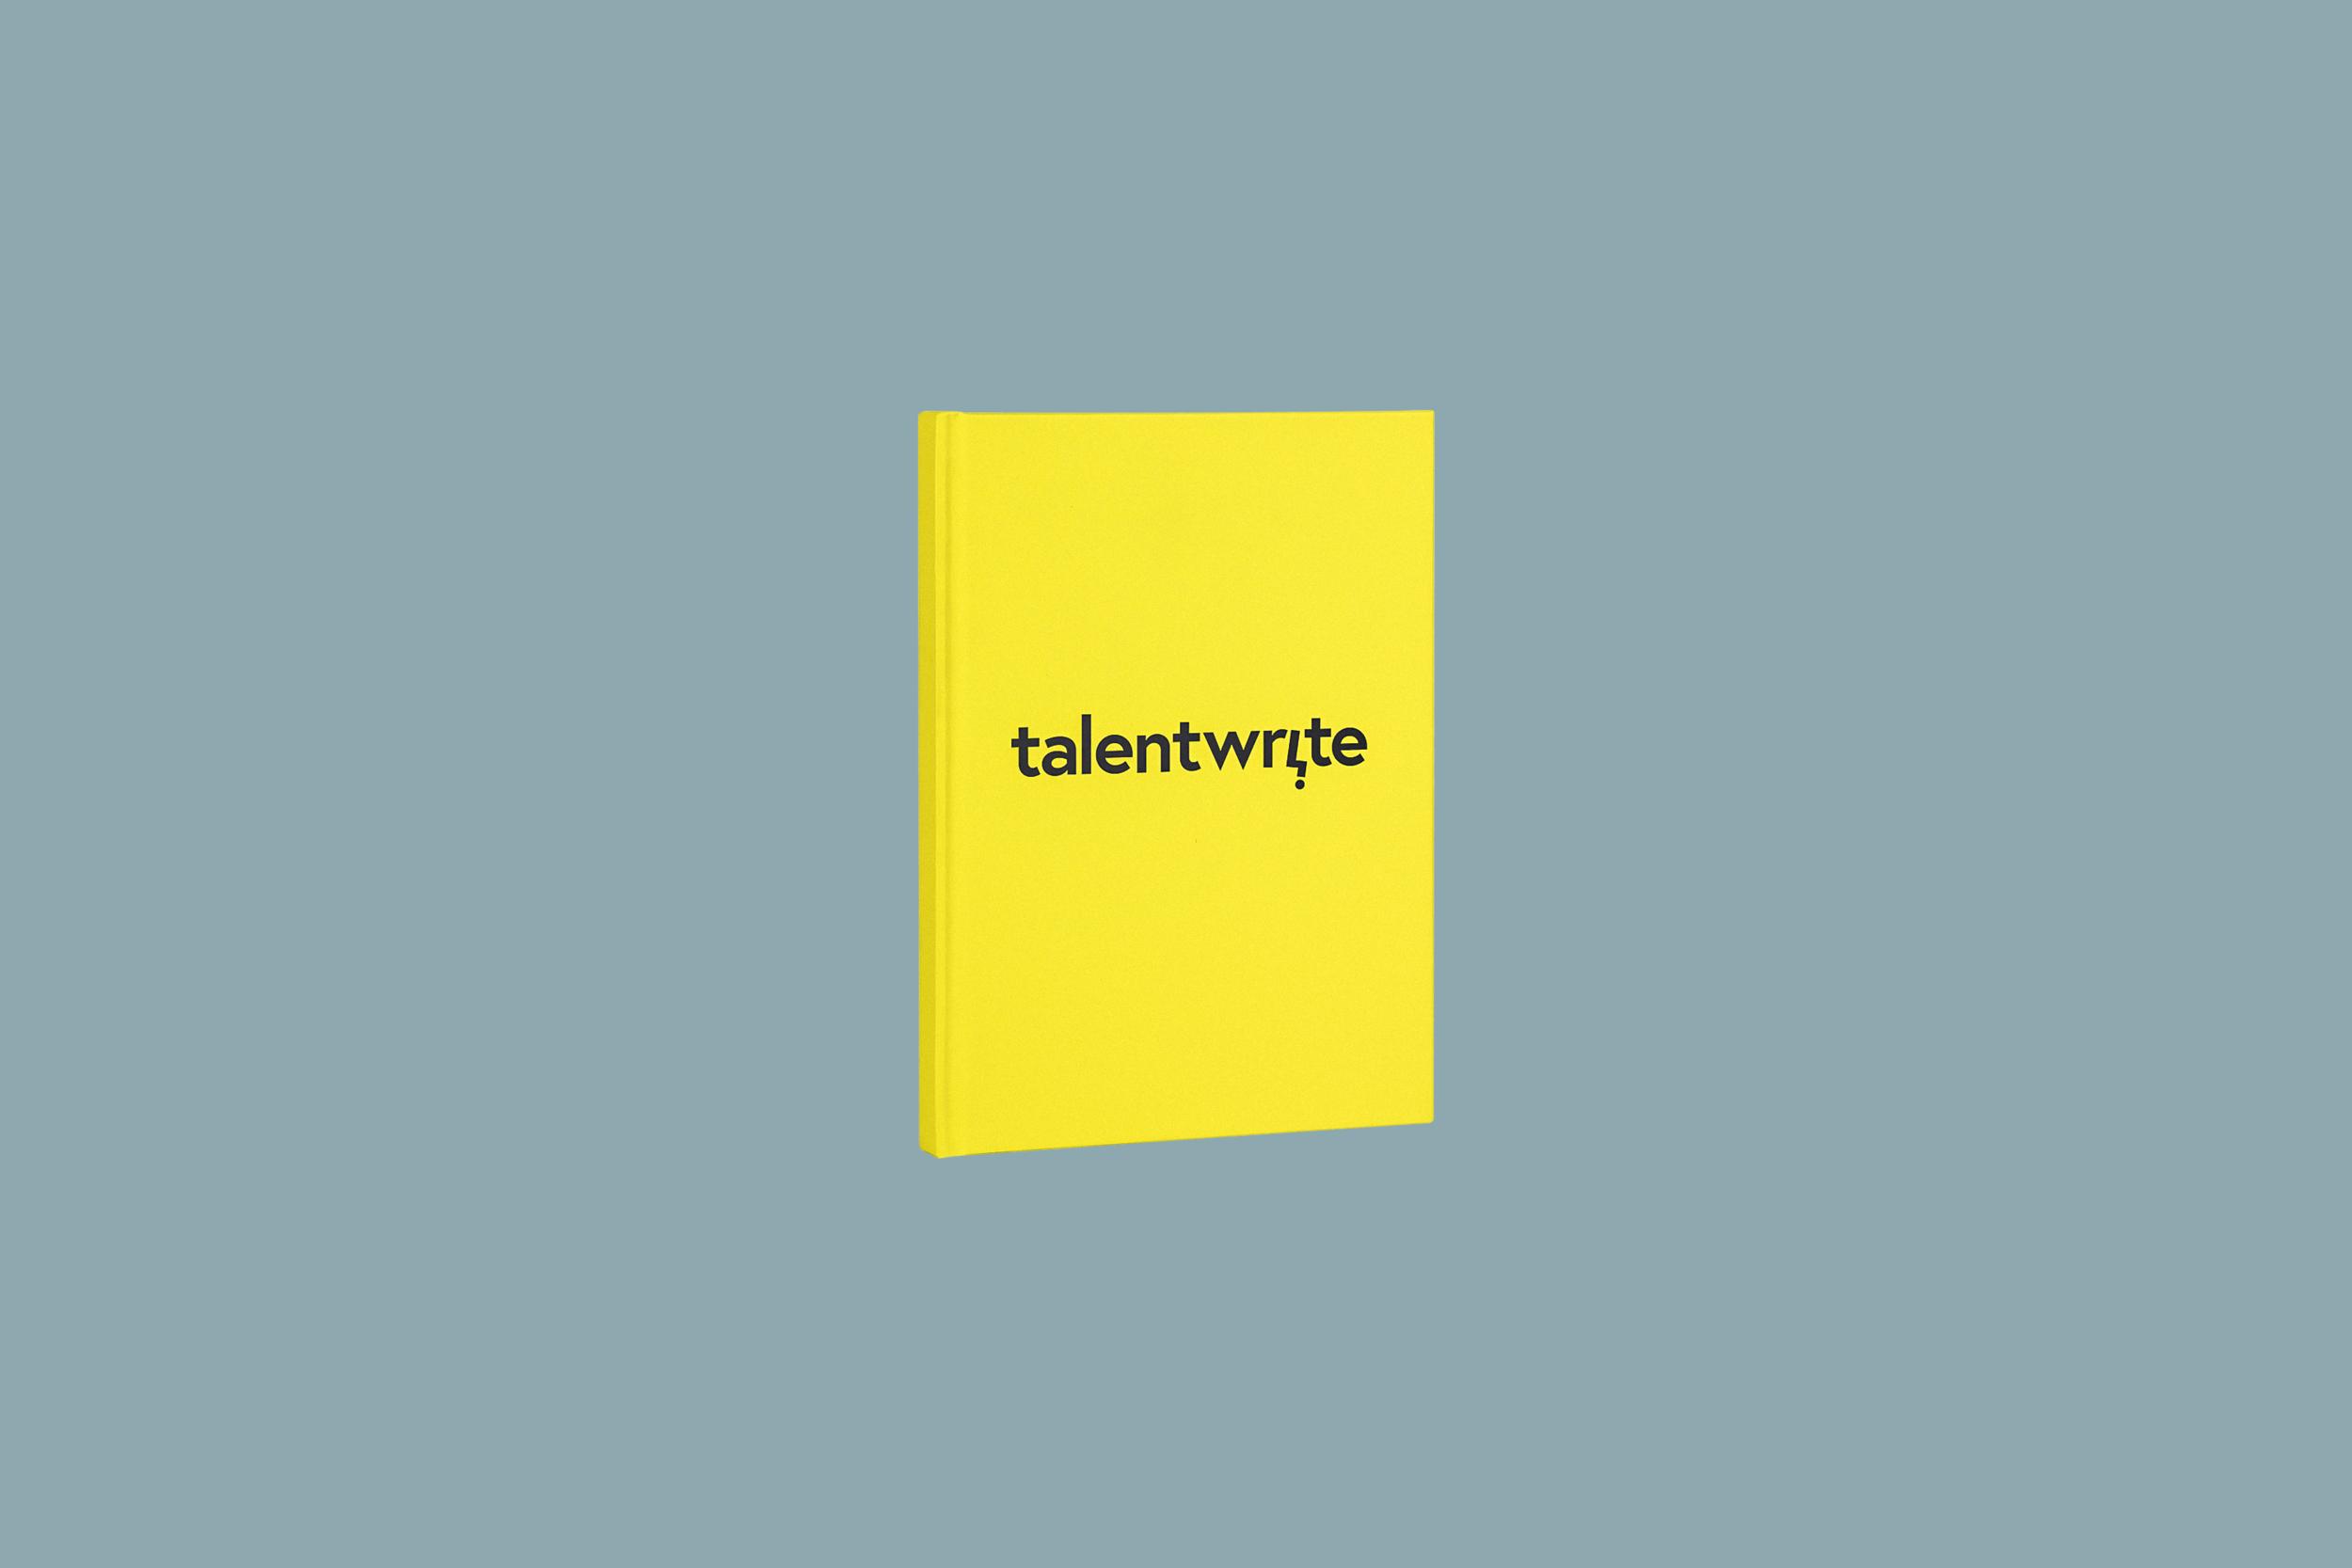 Talentwrite_notebook.png